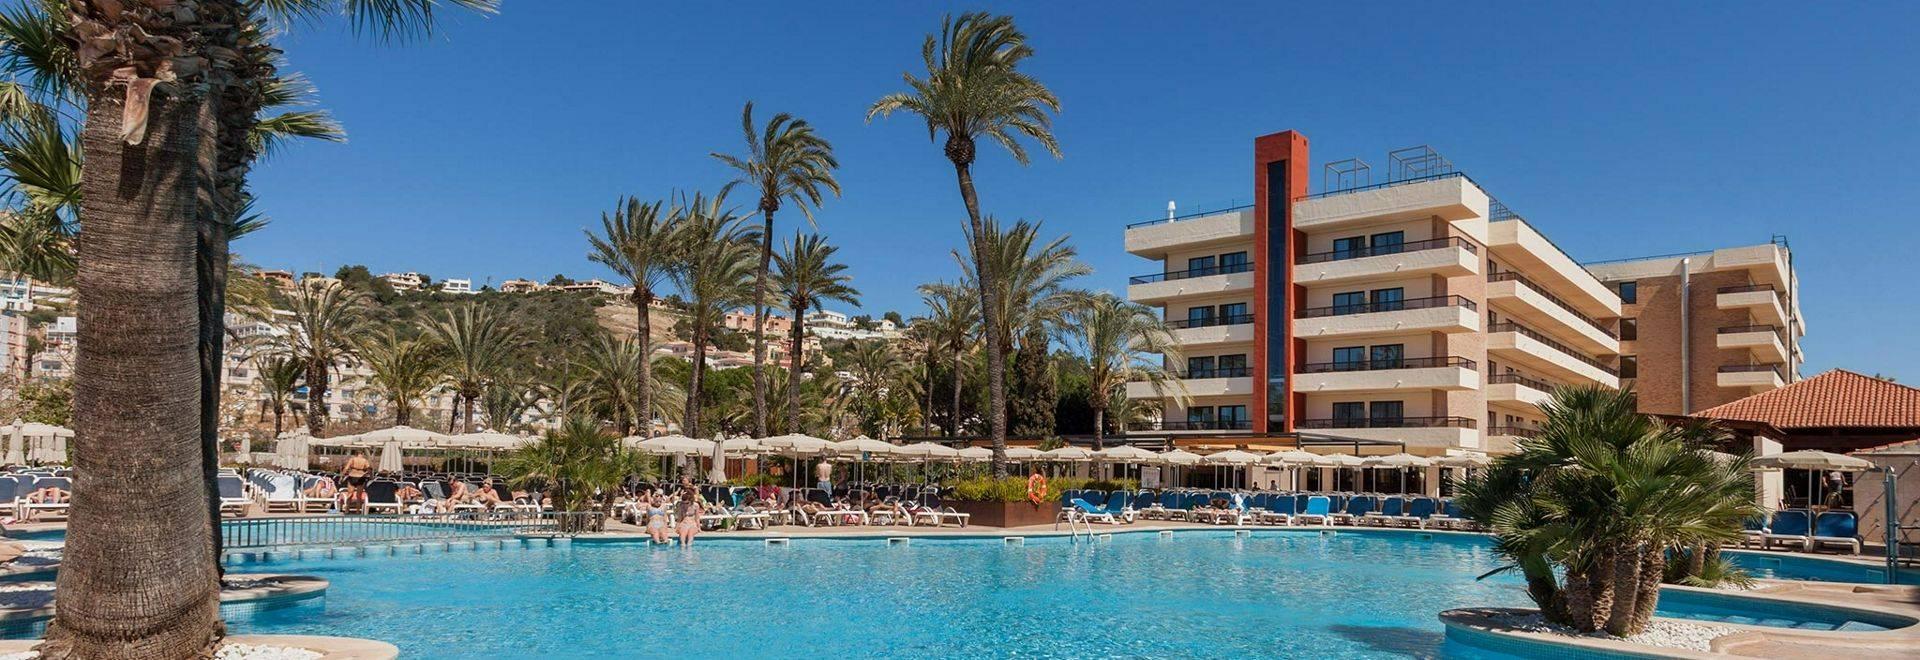 piscinas---zafiro-rey-don-jaime--1-847.jpg